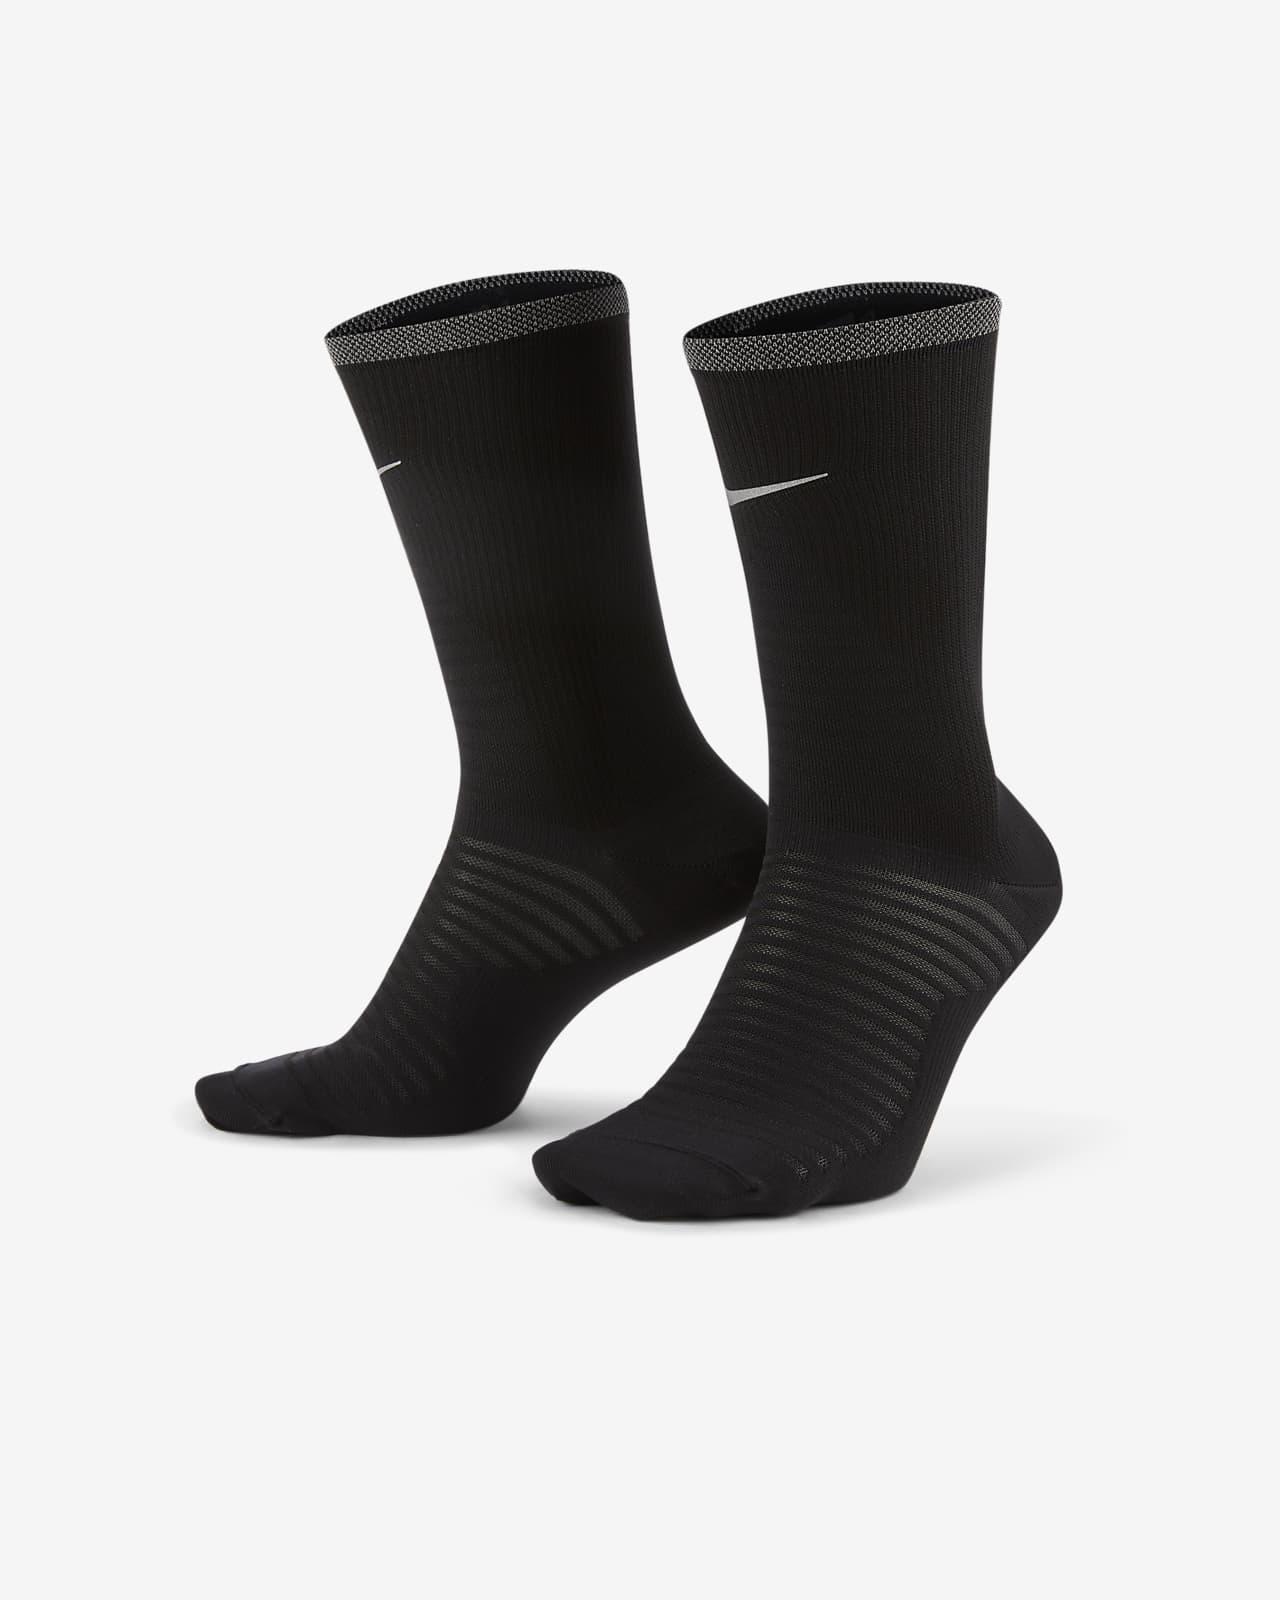 Nike Spark Lightweight Running Crew Socks